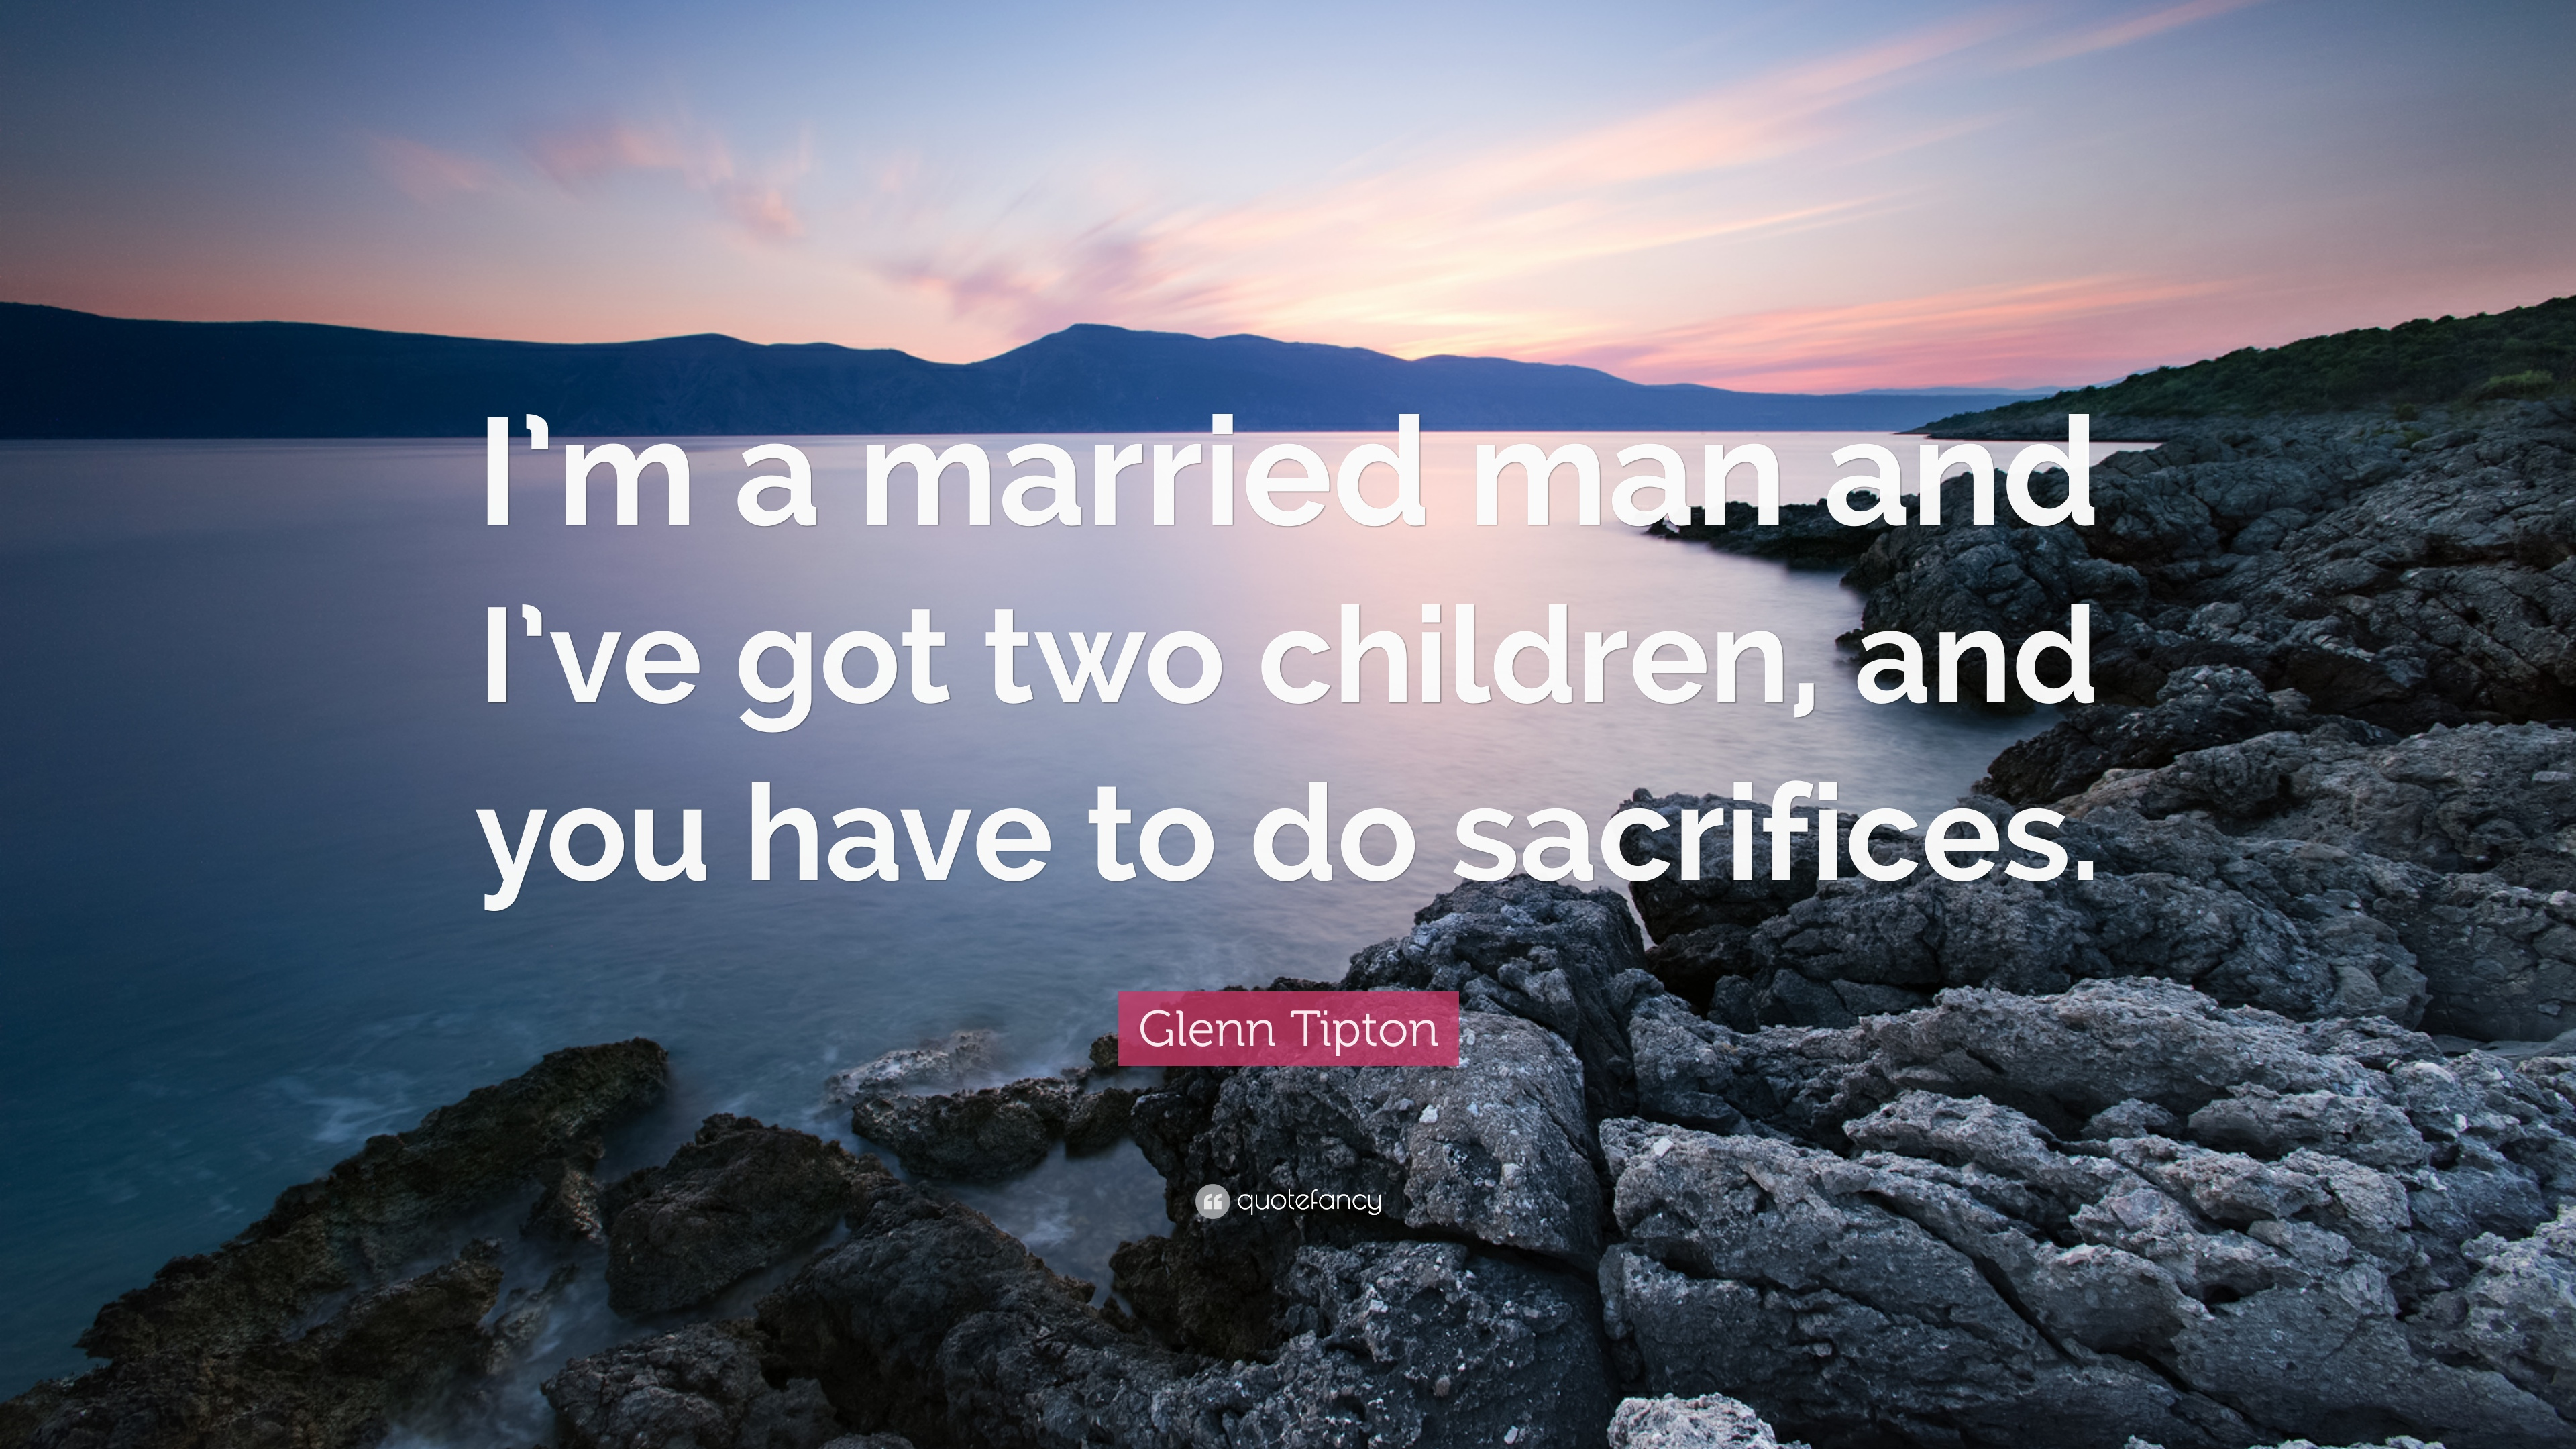 I m a married man